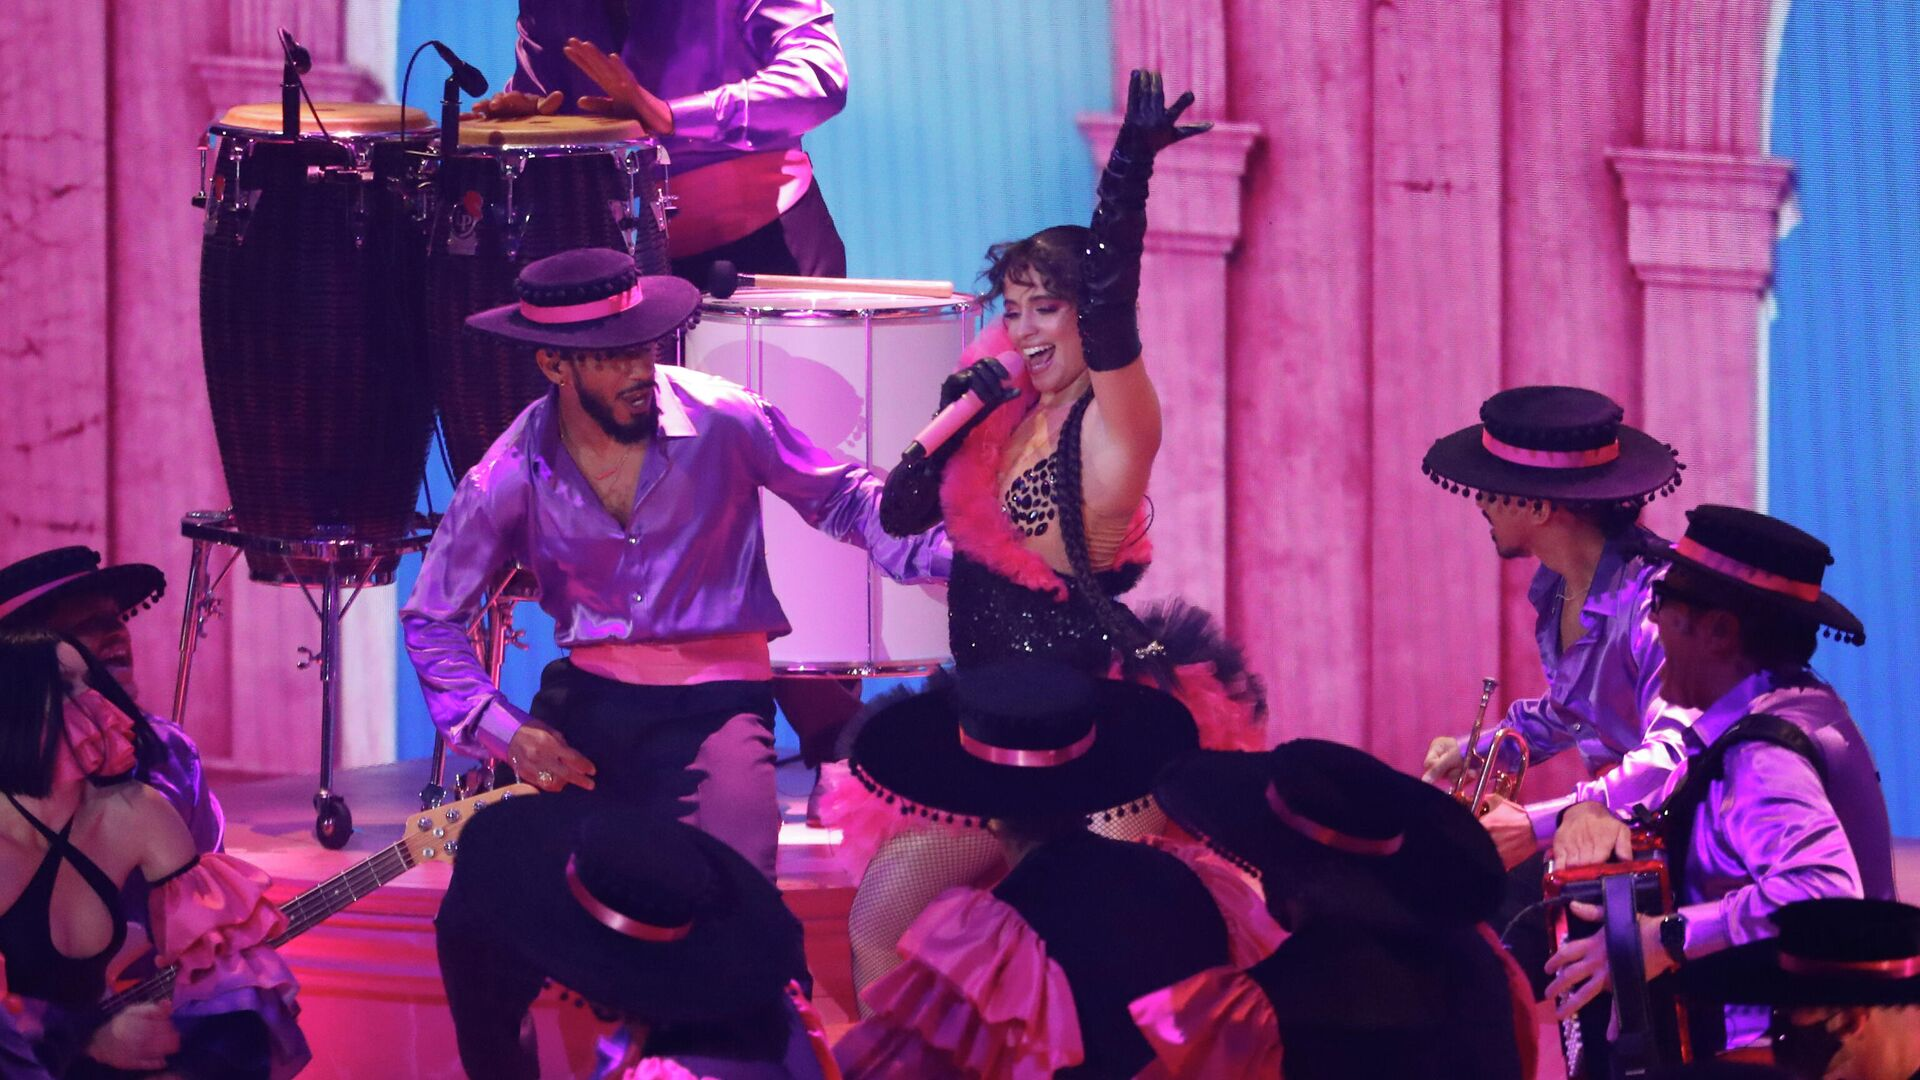 Camila Cabello en MTV Video Music Awards show - Sputnik Mundo, 1920, 13.09.2021